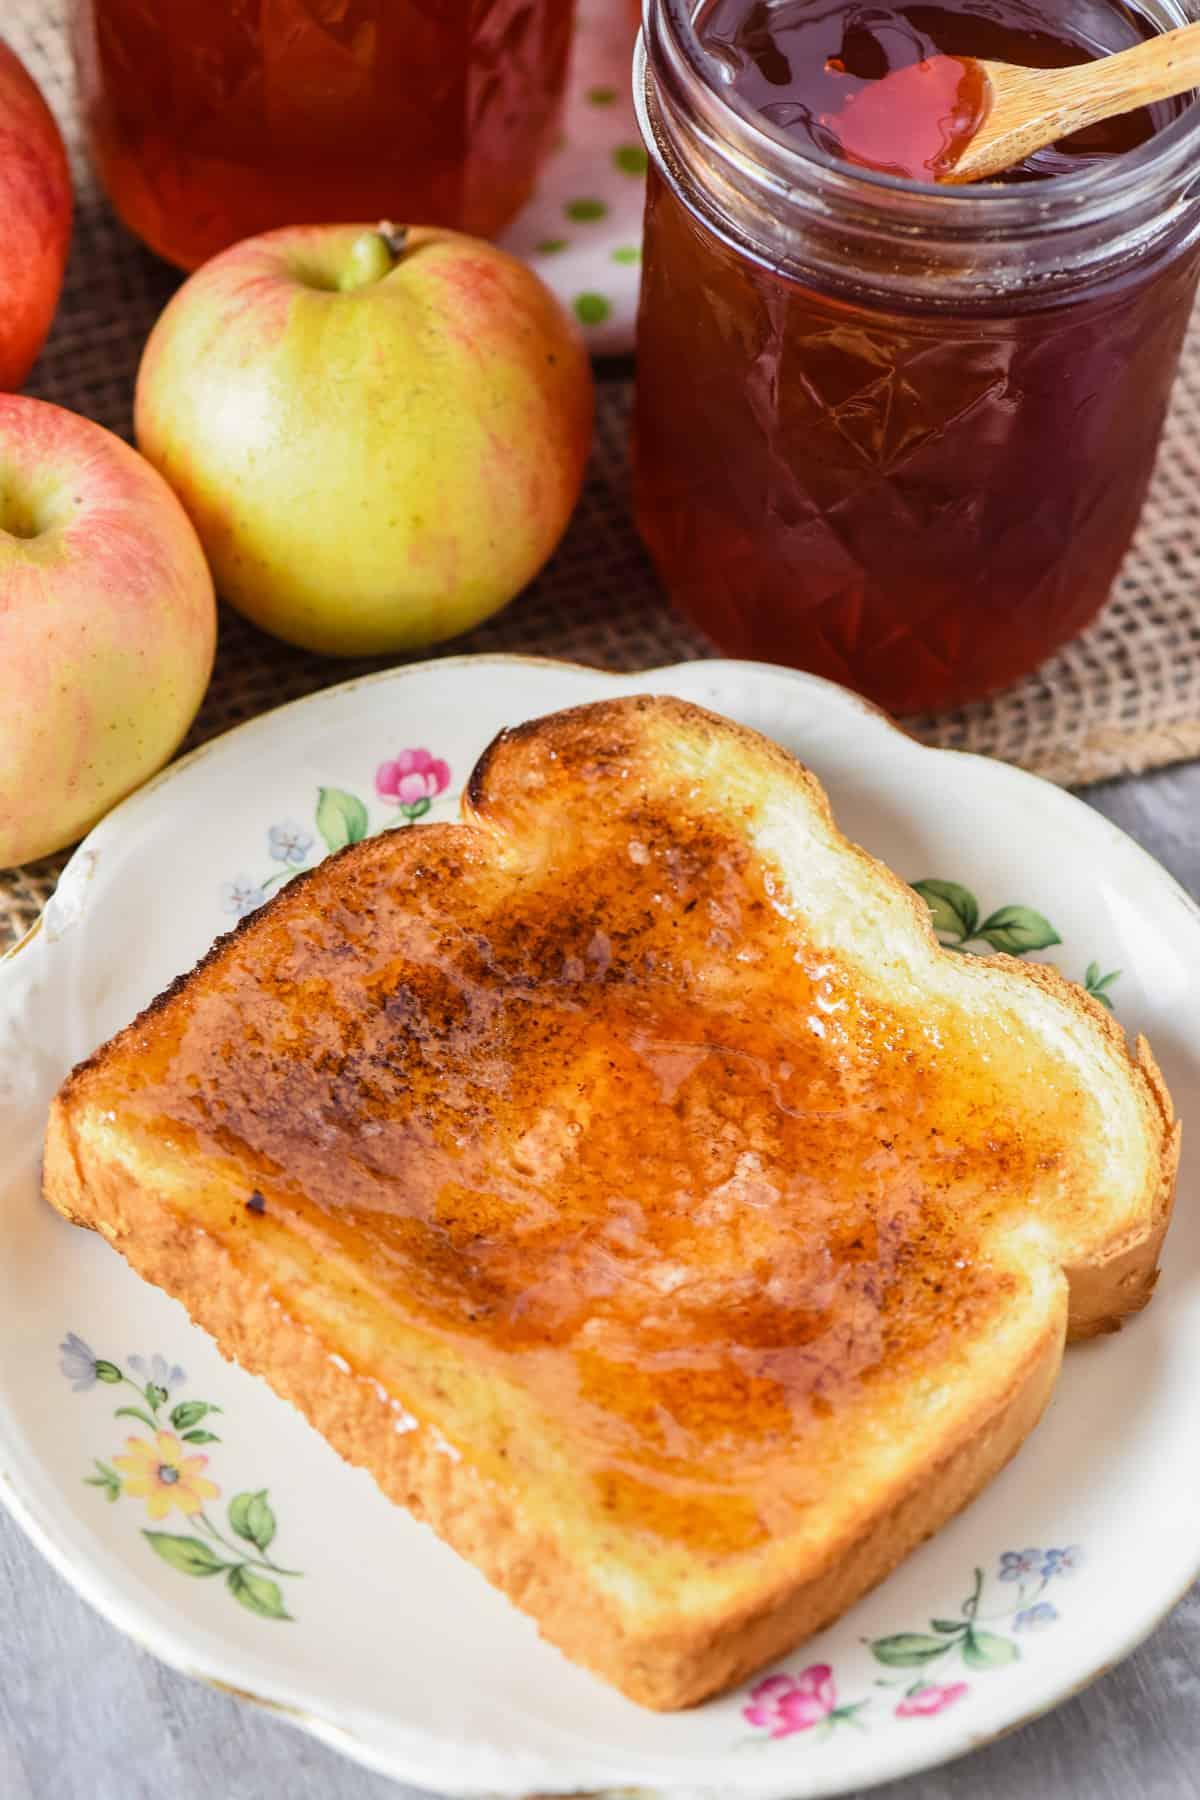 homemade apple jelly on toast on white flowered plate